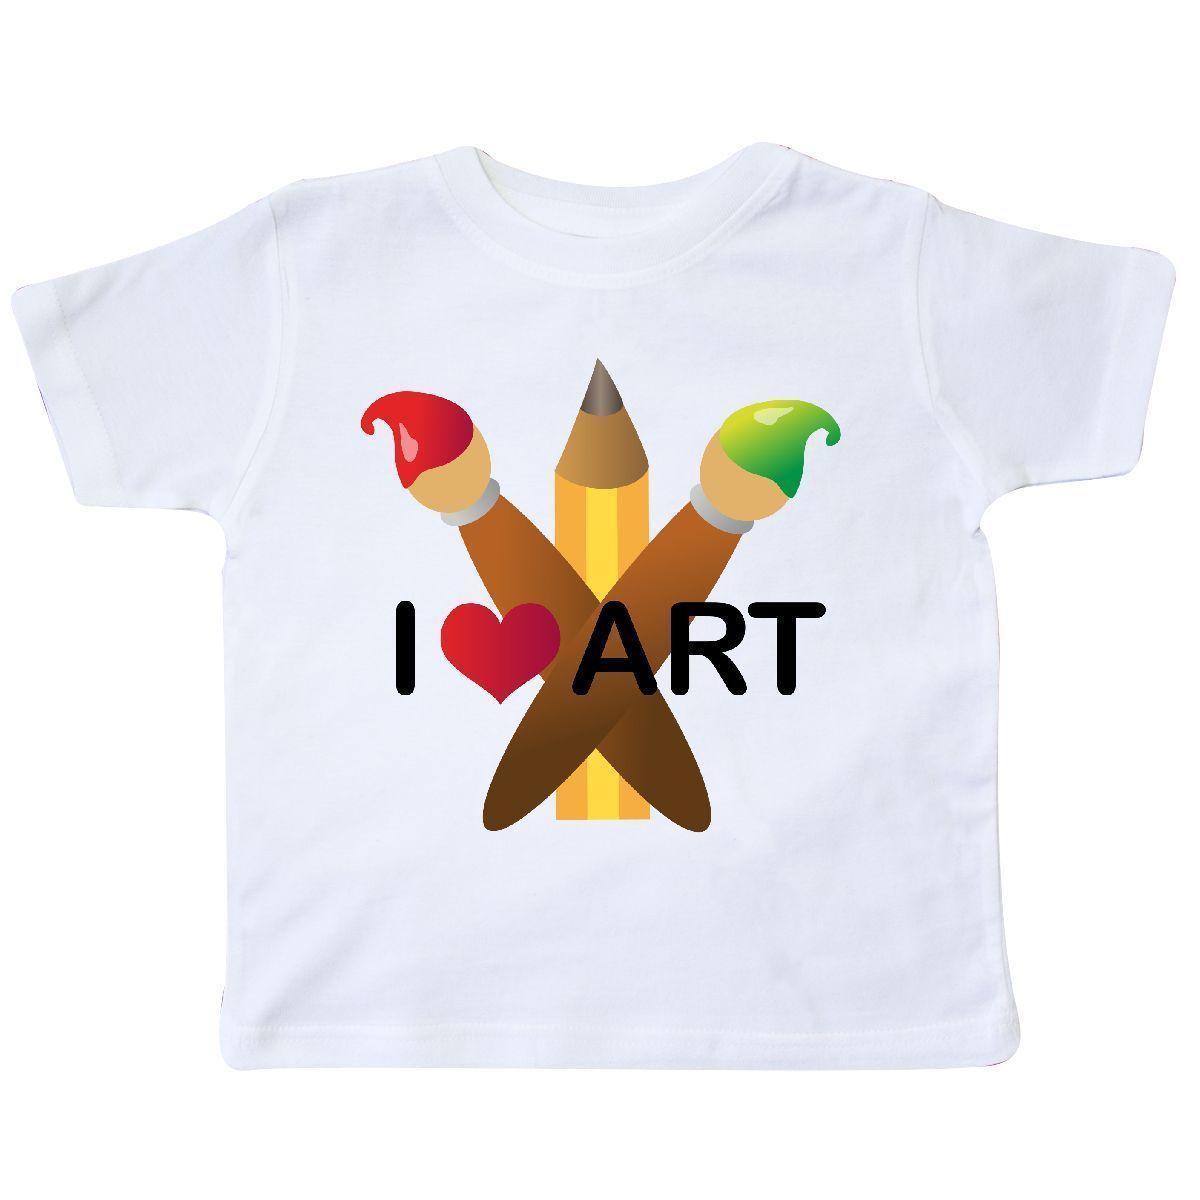 67d71dcb Inktastic I Love Art Painting Toddler T Shirt Artist Paint Brush Brushes  PencilMen Women Unisex Fashion Tshirt Shirt T Shirt Tee From  Customtshirt201801, ...